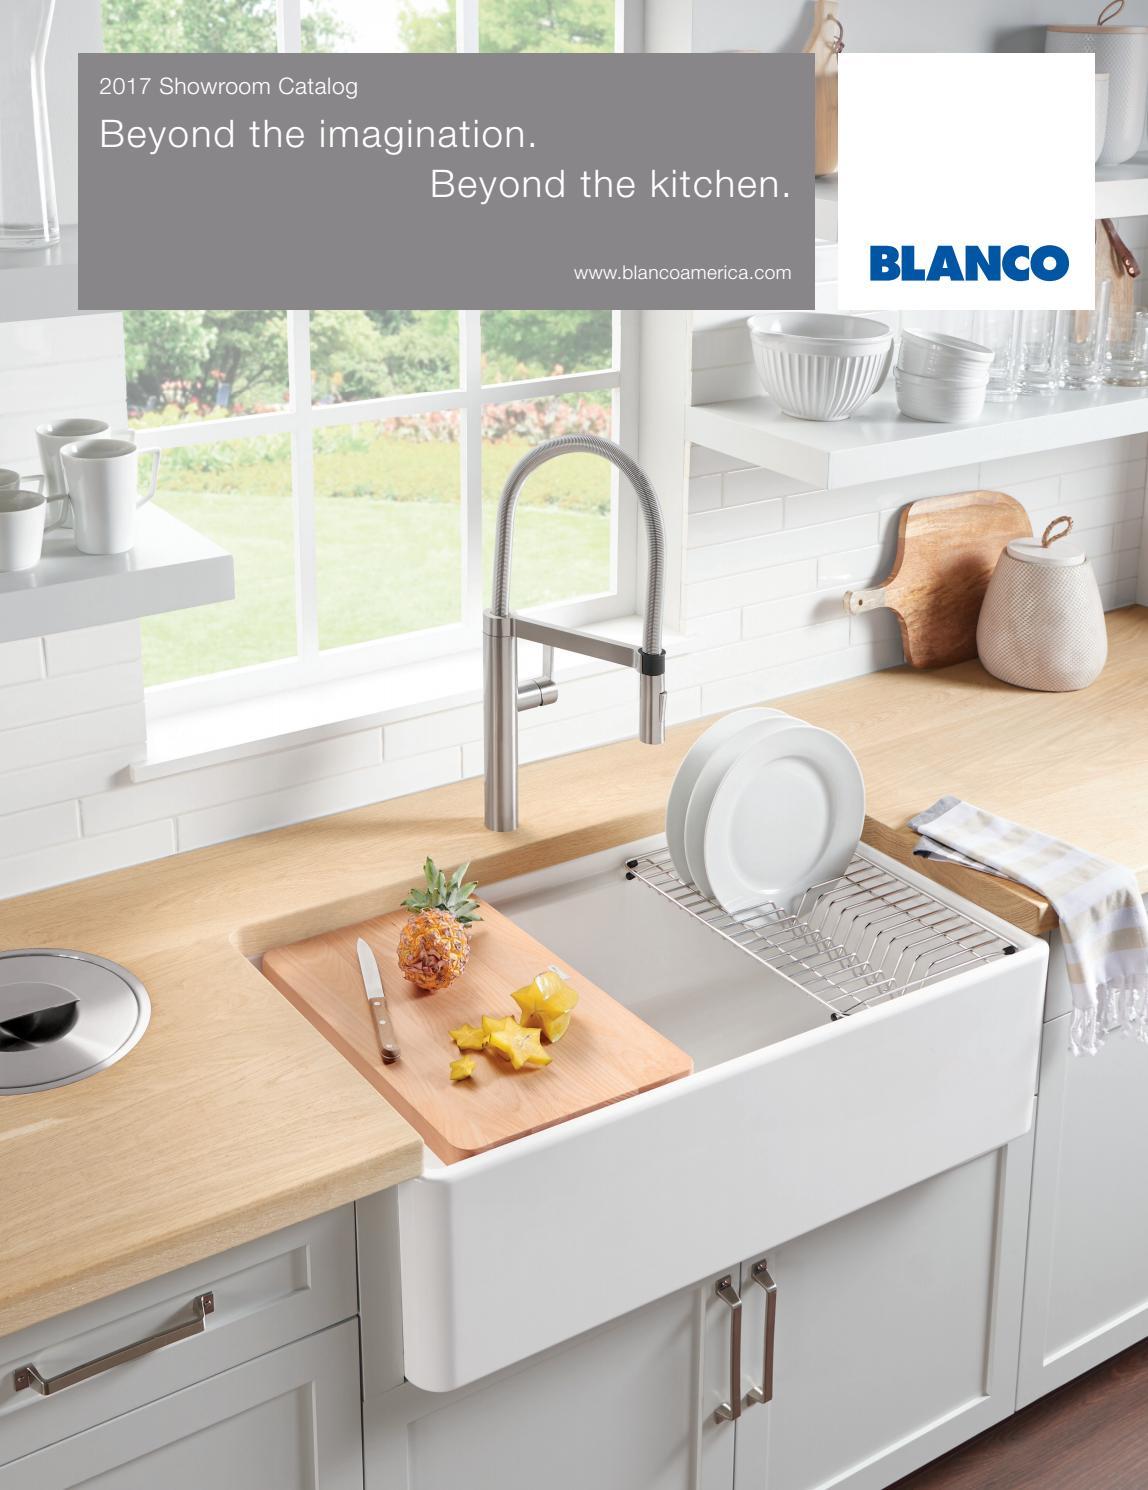 BLANCO 2017 Showroom Catalog By BLANCO   Issuu